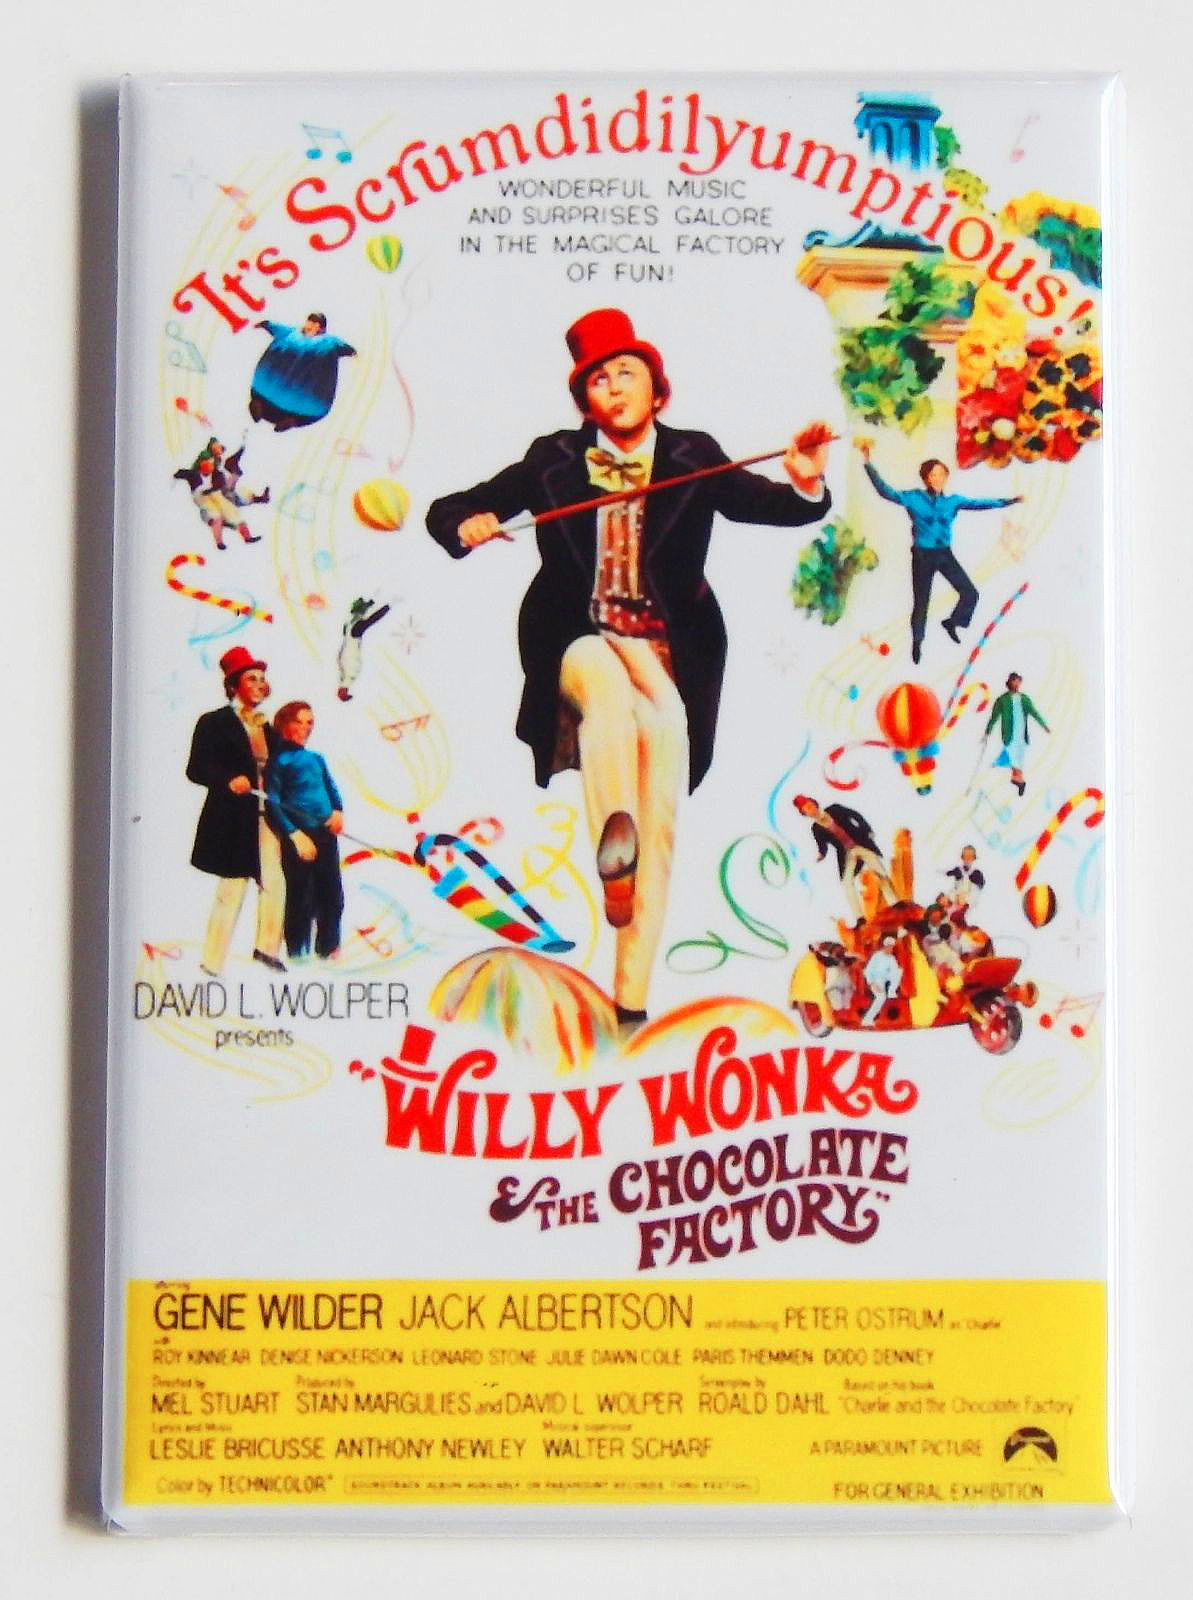 Willy wonka magnet 2x3